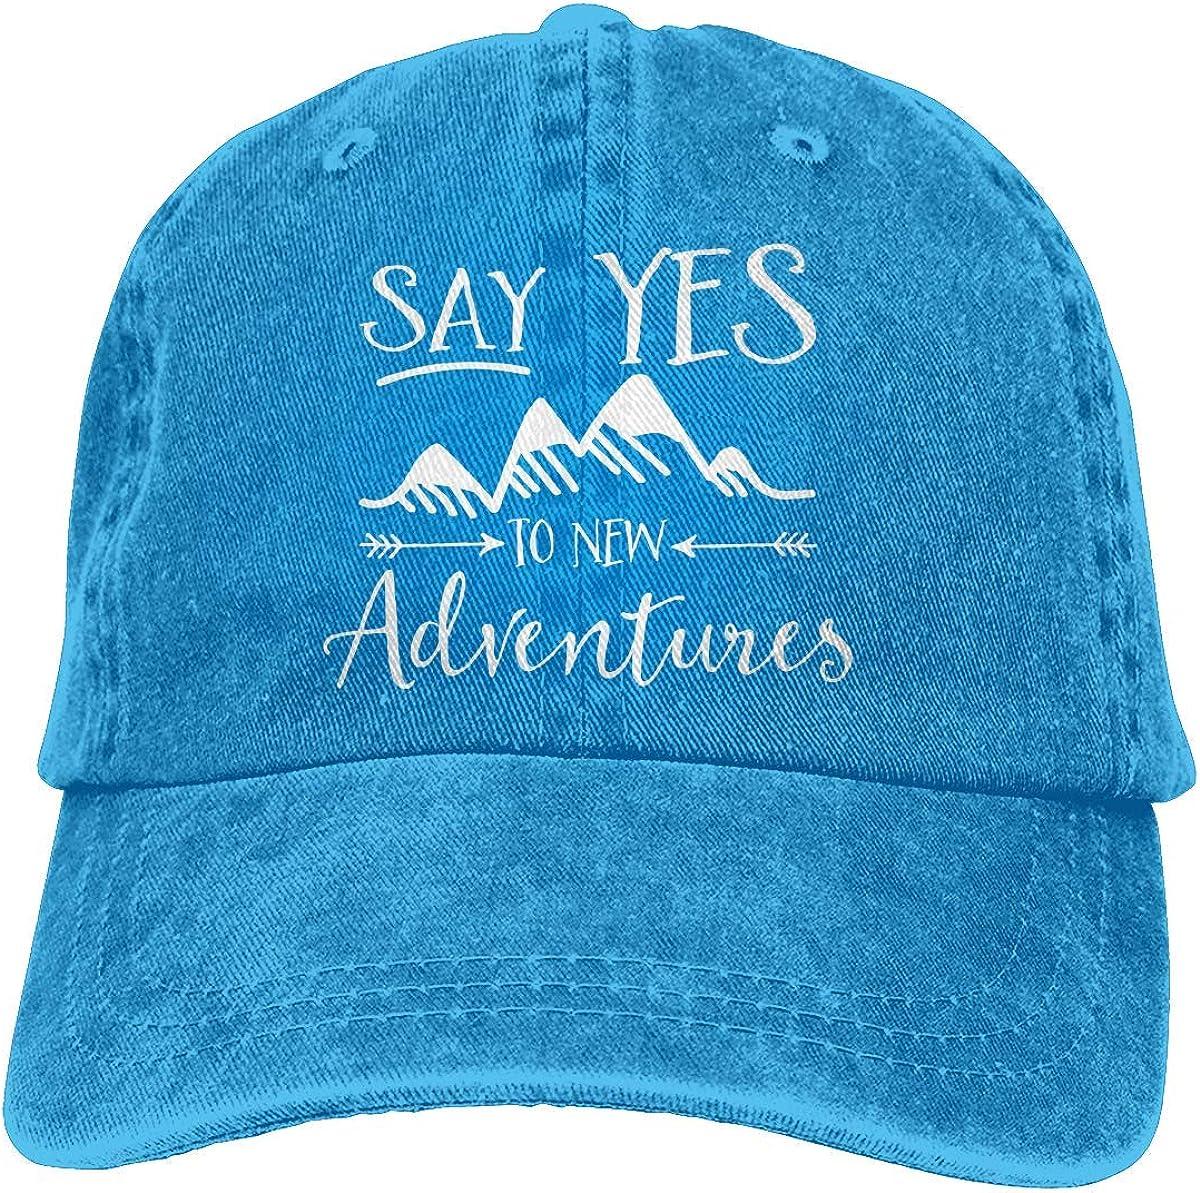 Say Yes to Adventure Unisex Mens Womens Denim Strapback Baseball Cap